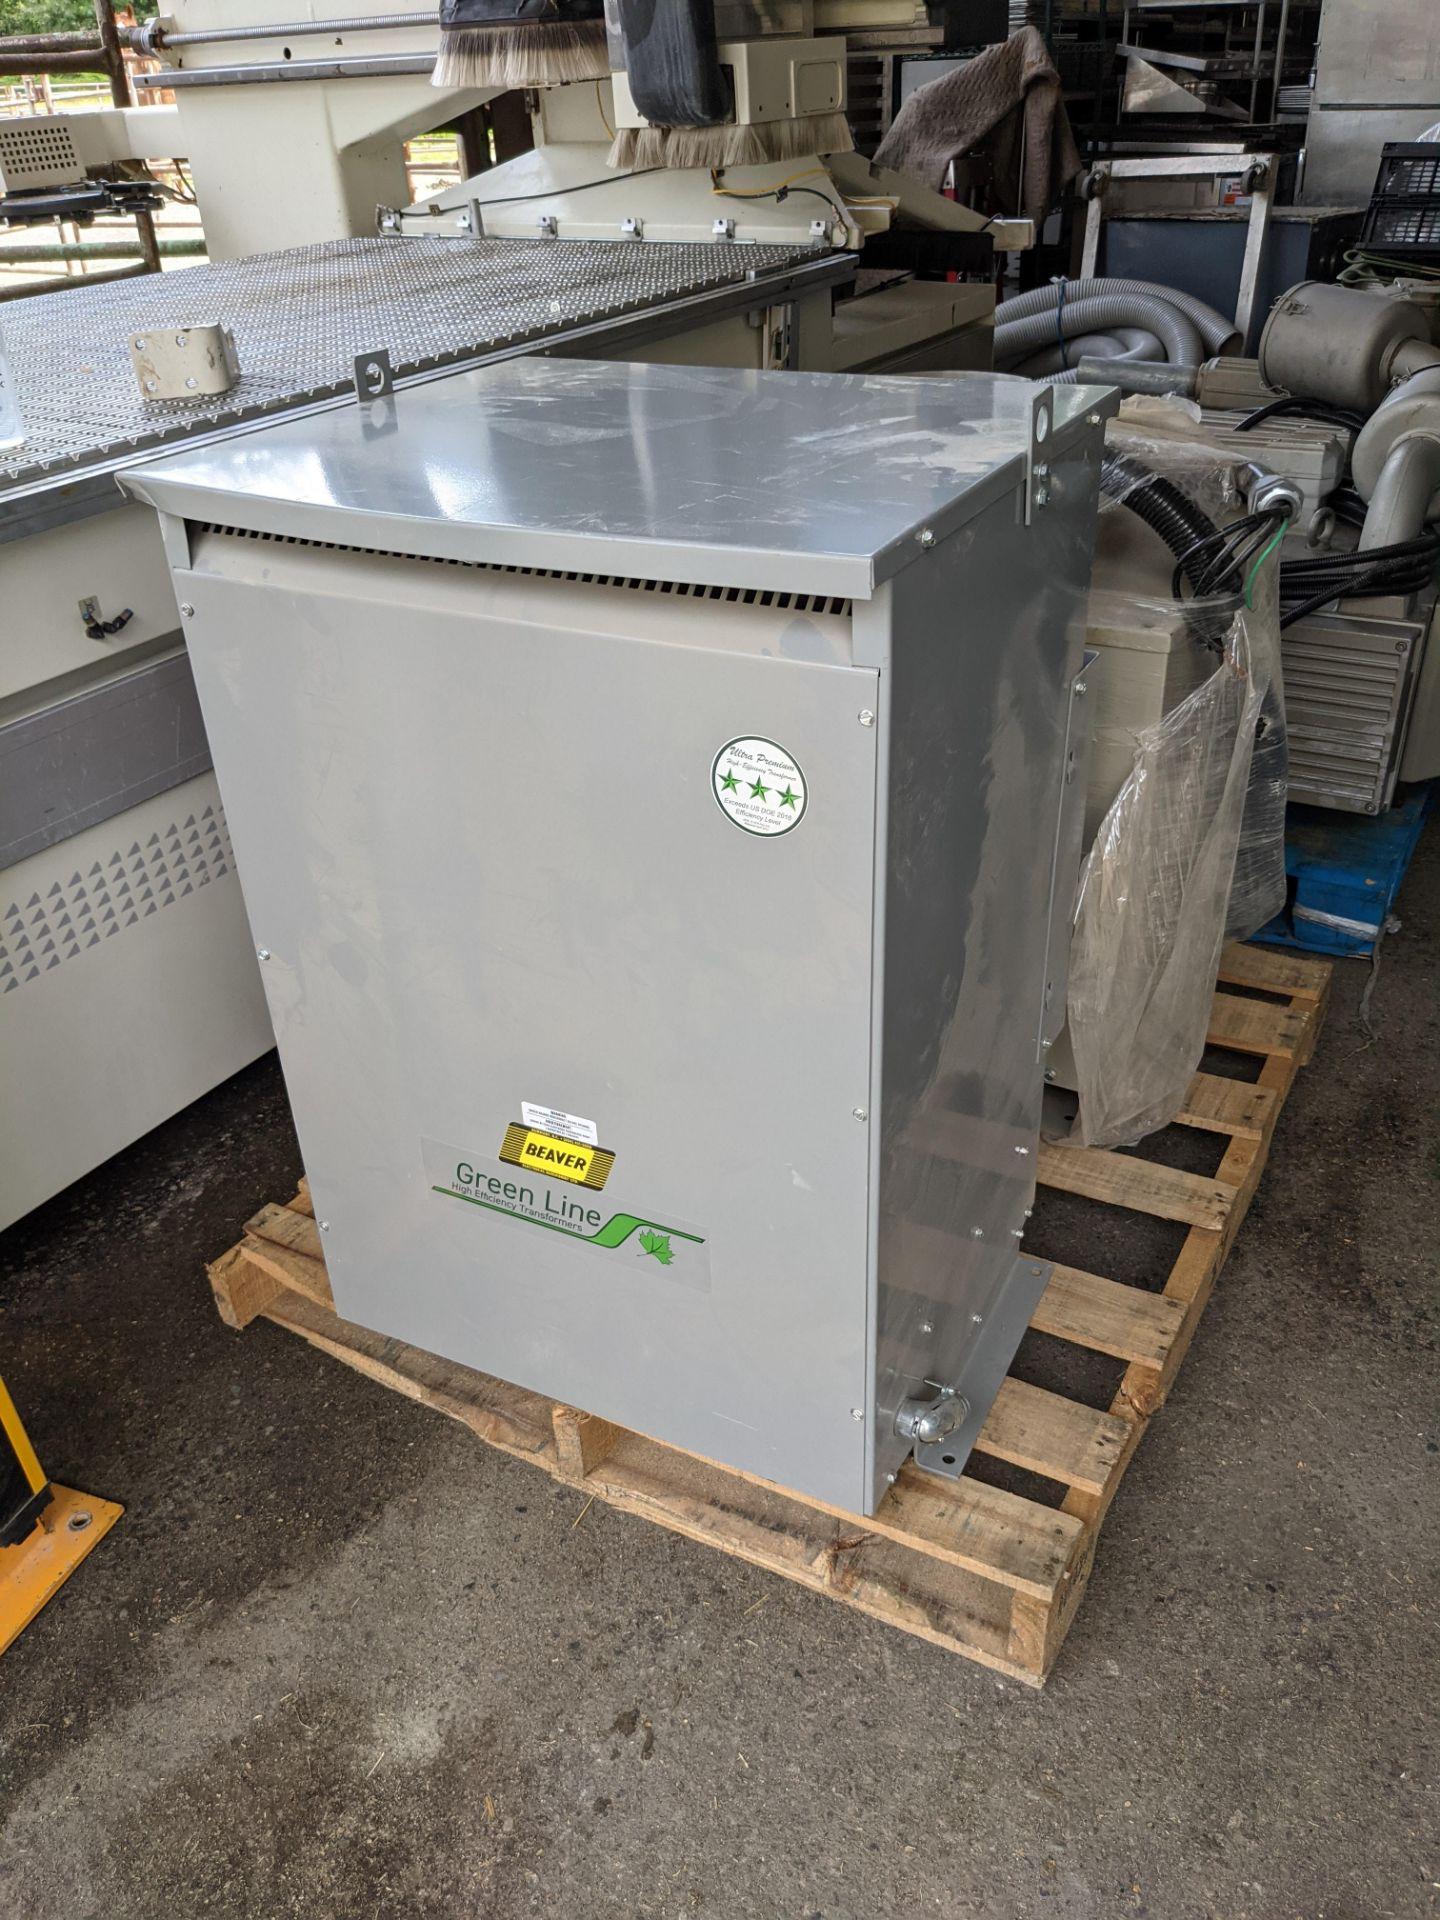 SCM PRATIX 48 NST CNC Nesting Machine with 2 Transformers and 2 Vacuum Pumps - Image 4 of 5